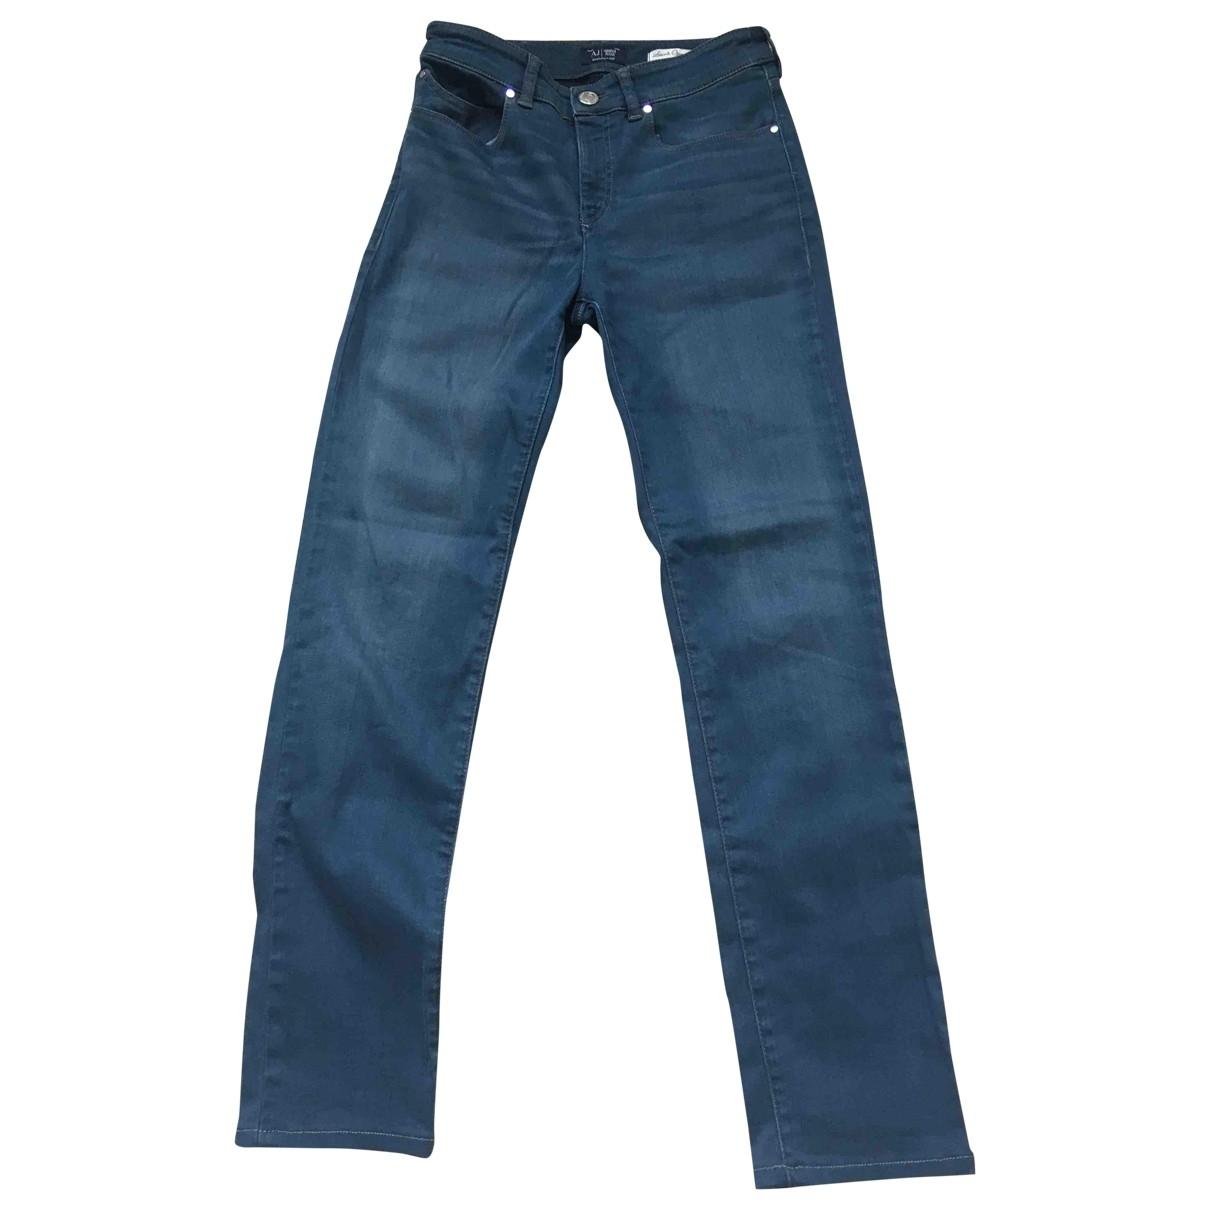 Vaquero recto Armani Jeans